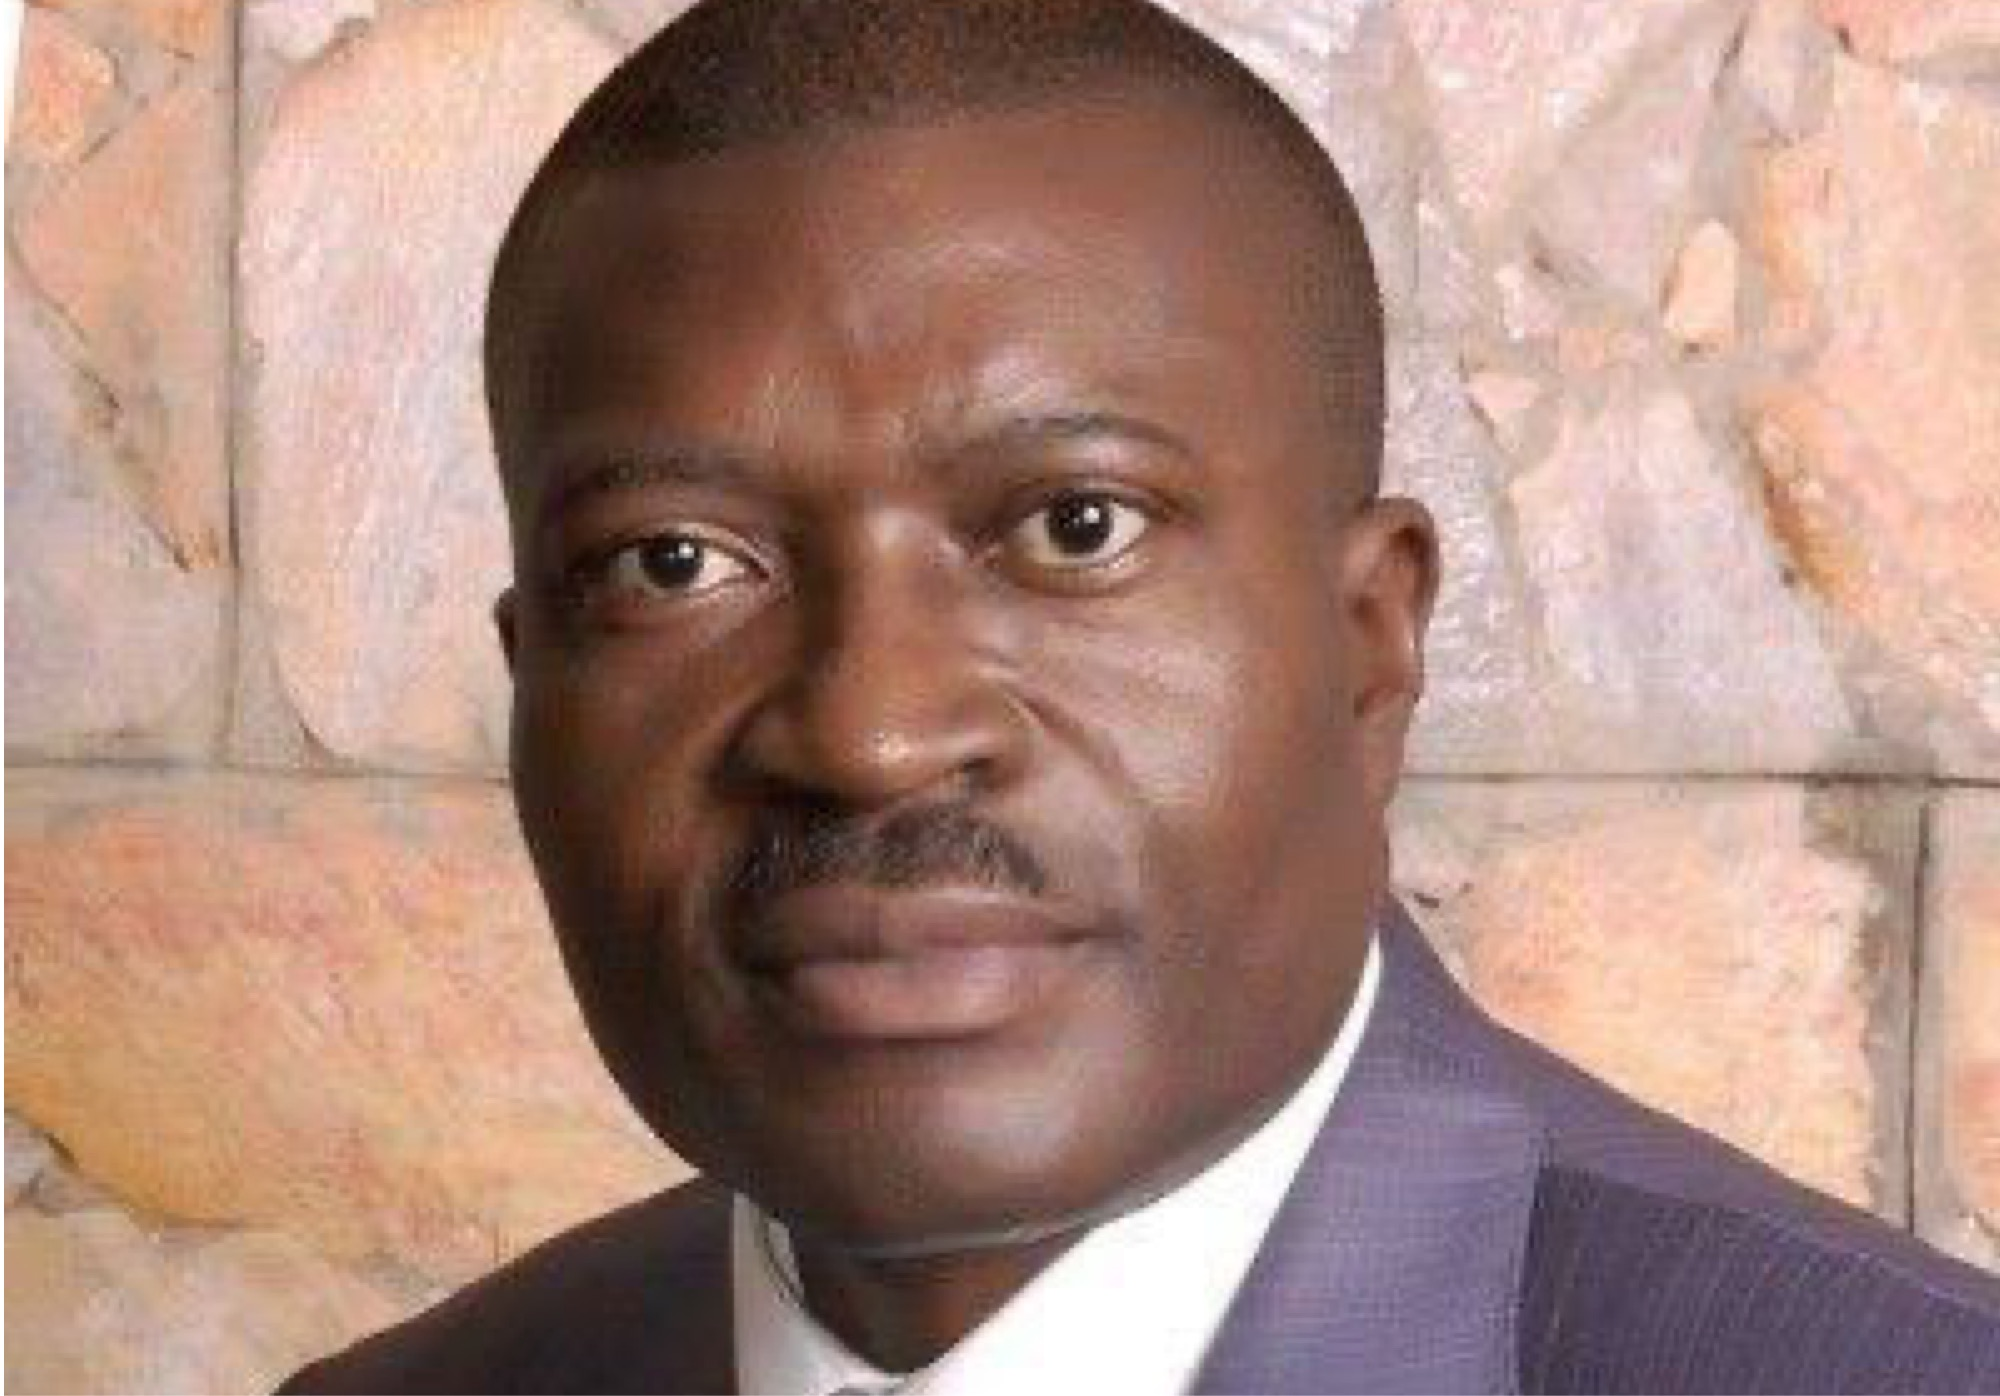 'Never Receive Counsel From Unproductive People' - Kanayo O. Kanayo